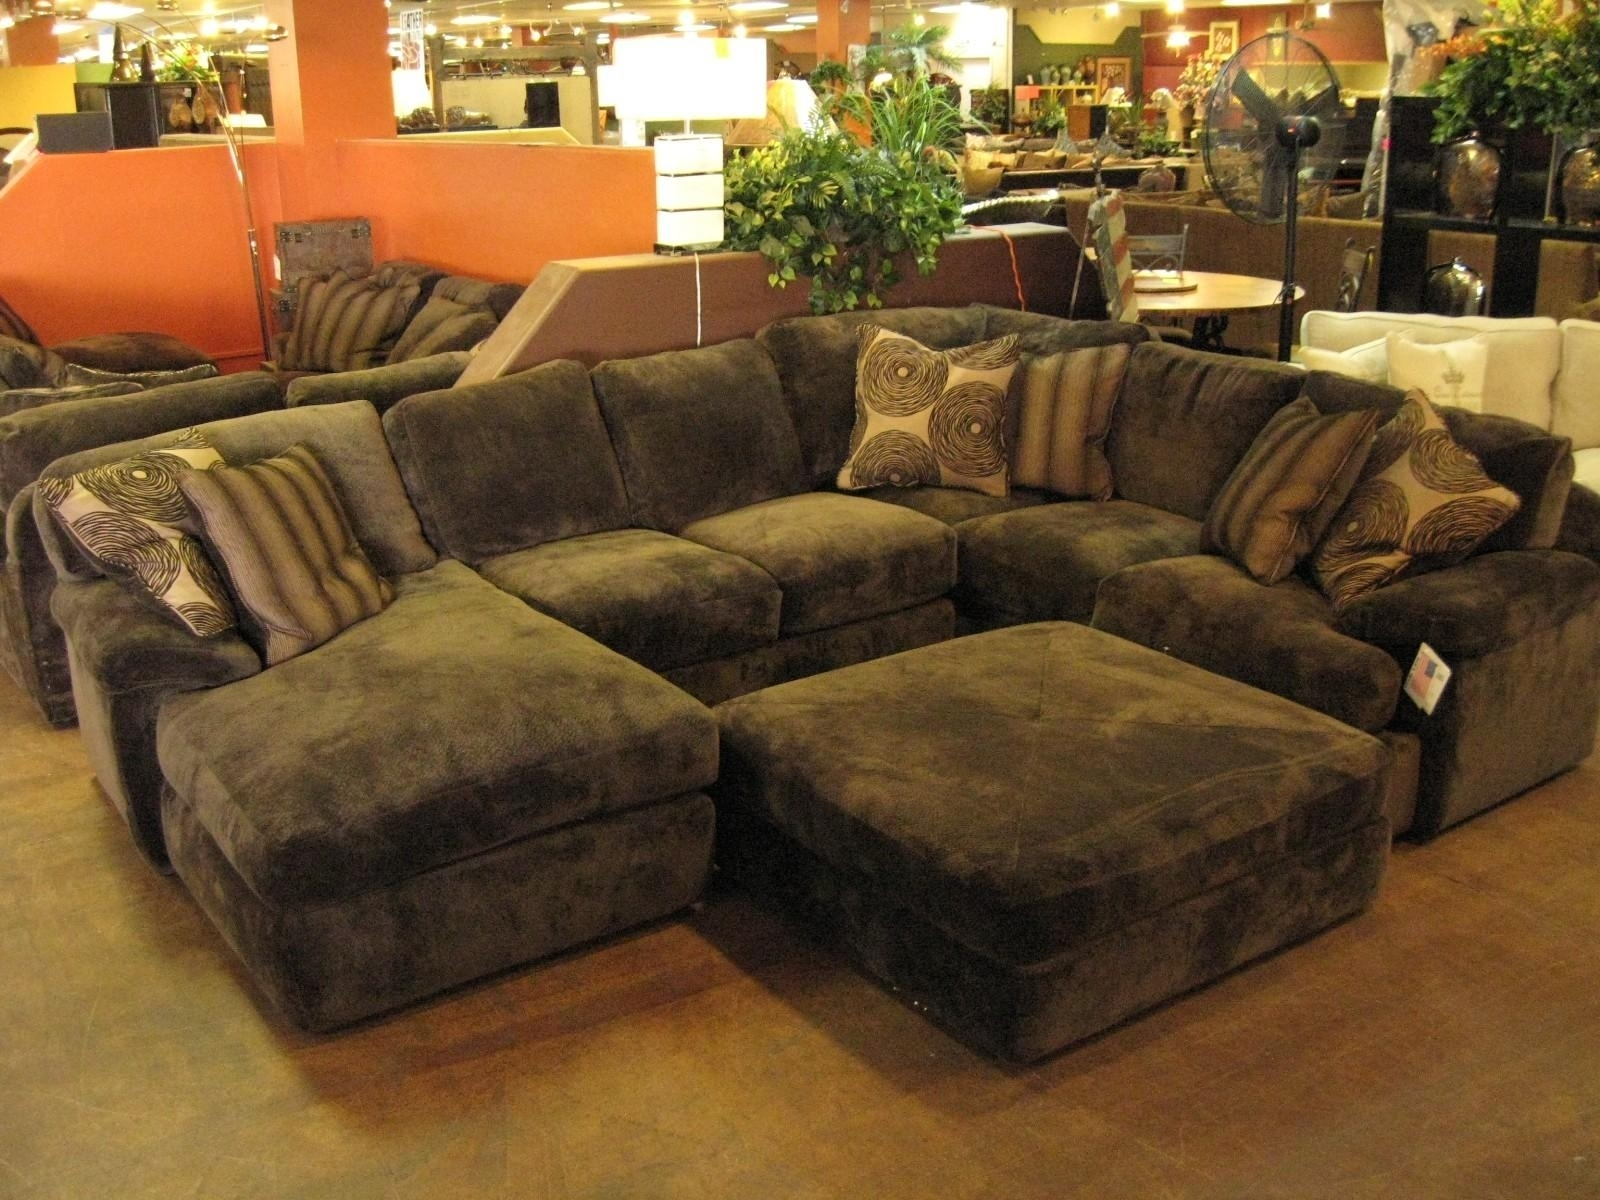 20 Top Sectional Sofa With Large Ottoman | Sofa Ideas intended for Sofas With Large Ottoman (Image 1 of 10)